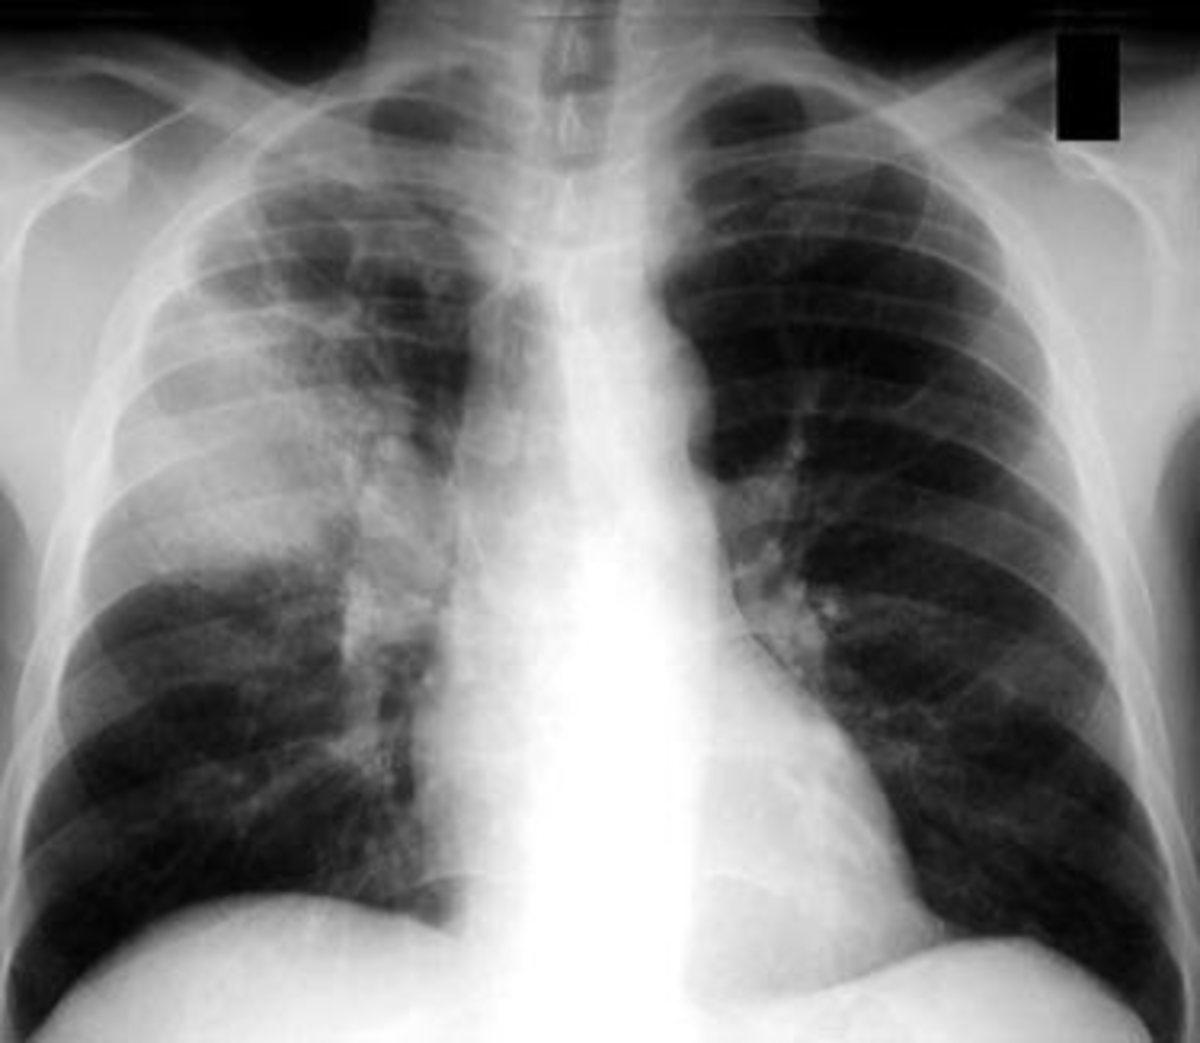 Pneumonia Manifestation Seen And Diagnosed Via X-Rays